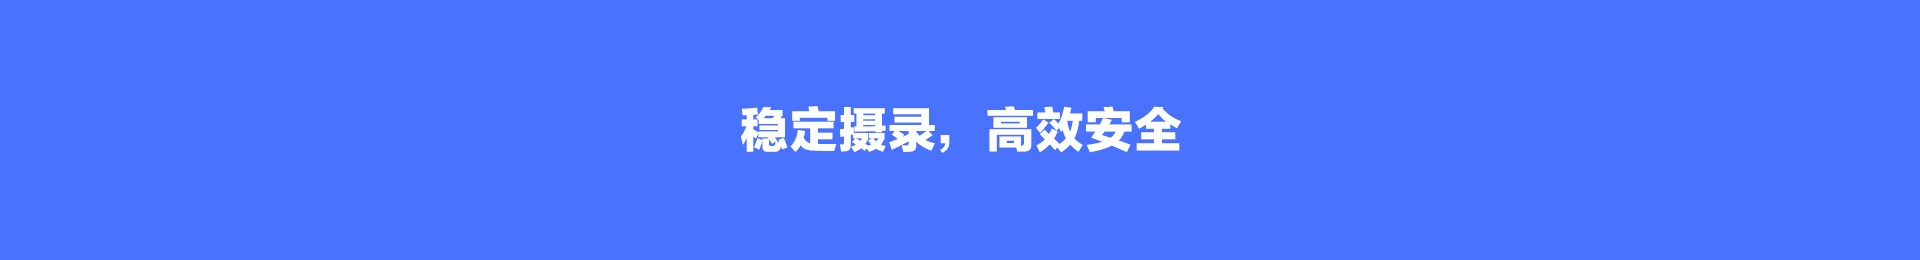 C3CPOE+X5SC-web_20.jpg